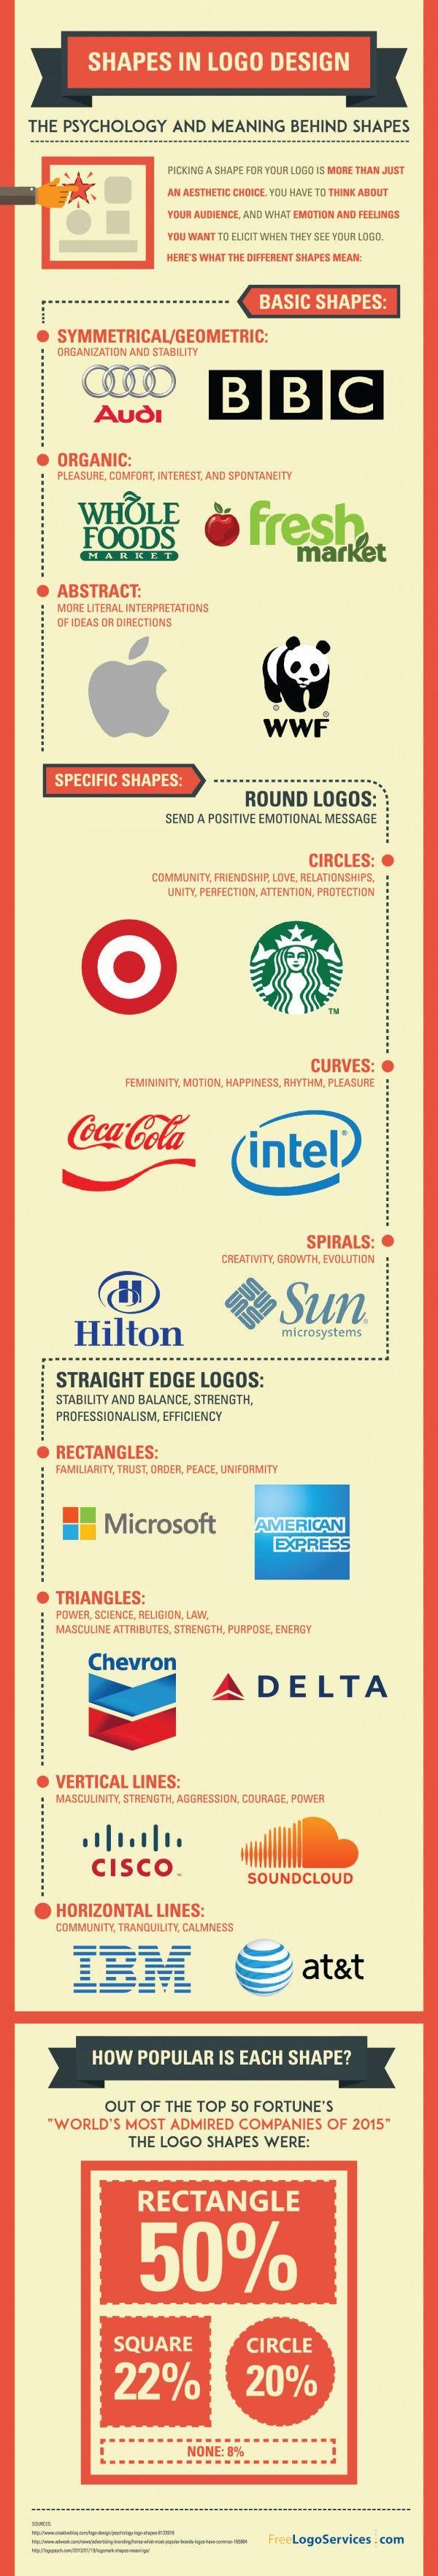 The Psychology of Shape in Logo Design | infographic via @HubSpot